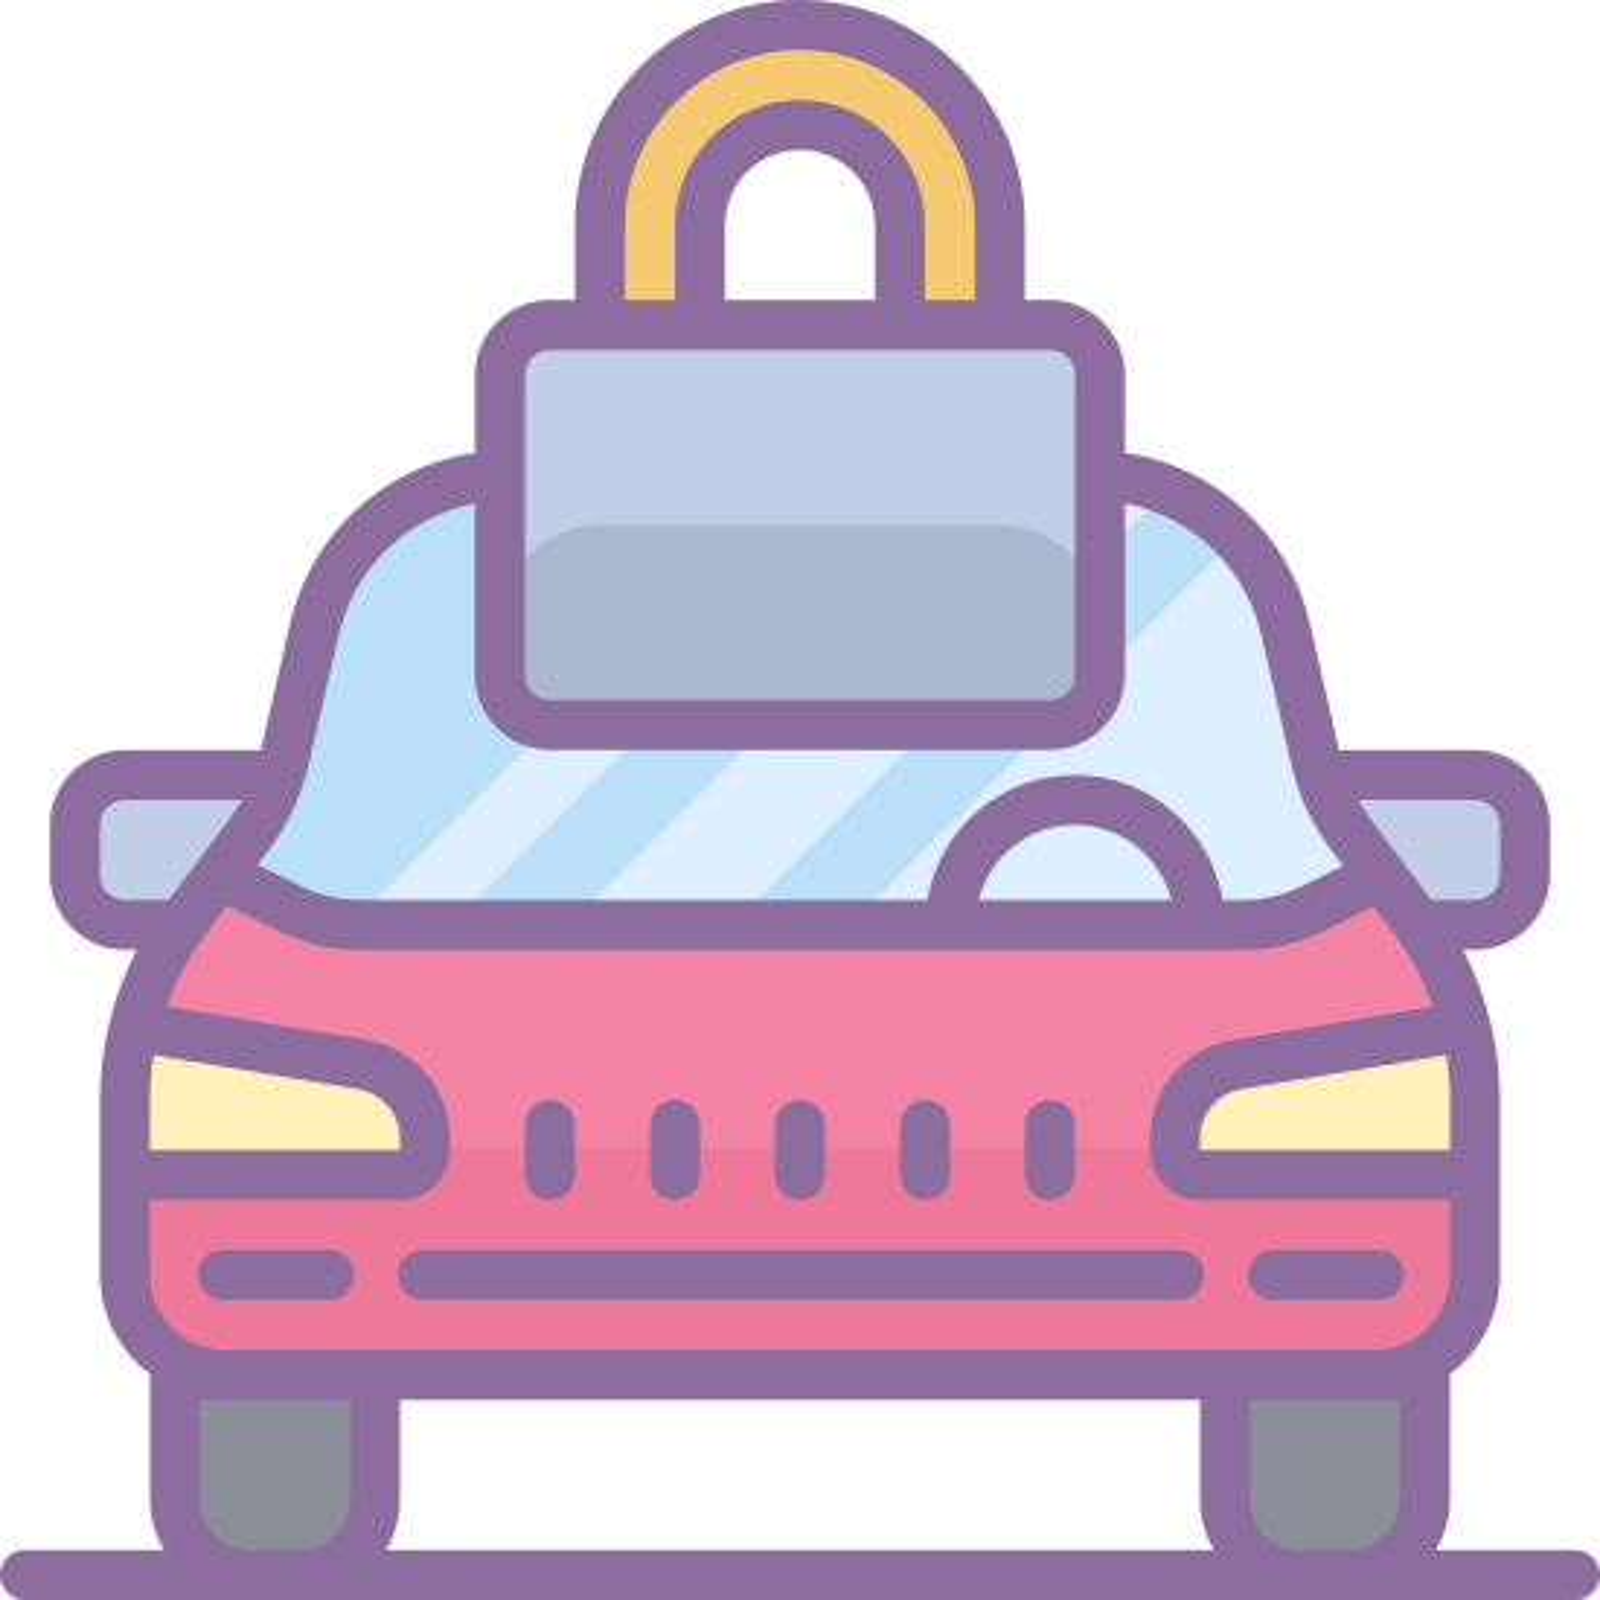 Vehicle Insurance icon